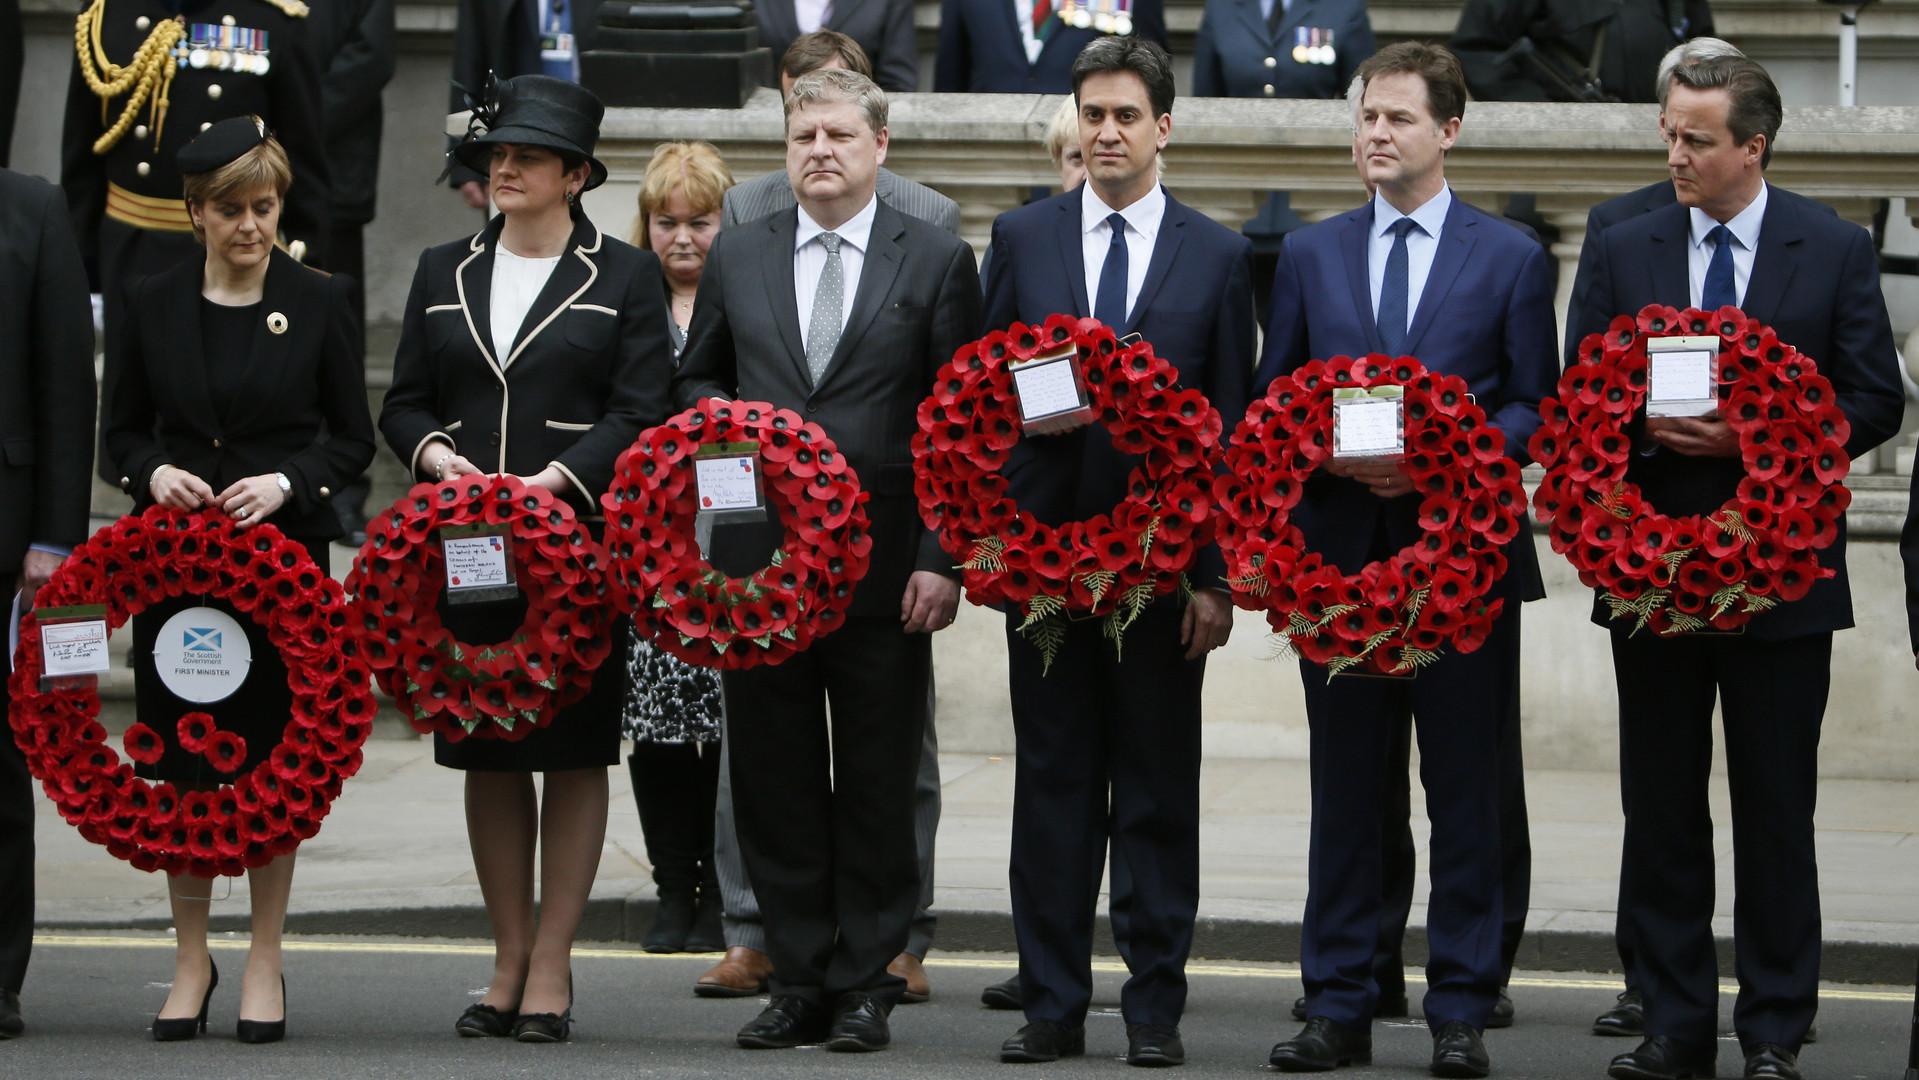 Nicola Sturgeon avec Arlene Foster, Angus Robertson, Ed Miliband, Nick Clegg et David Cameron